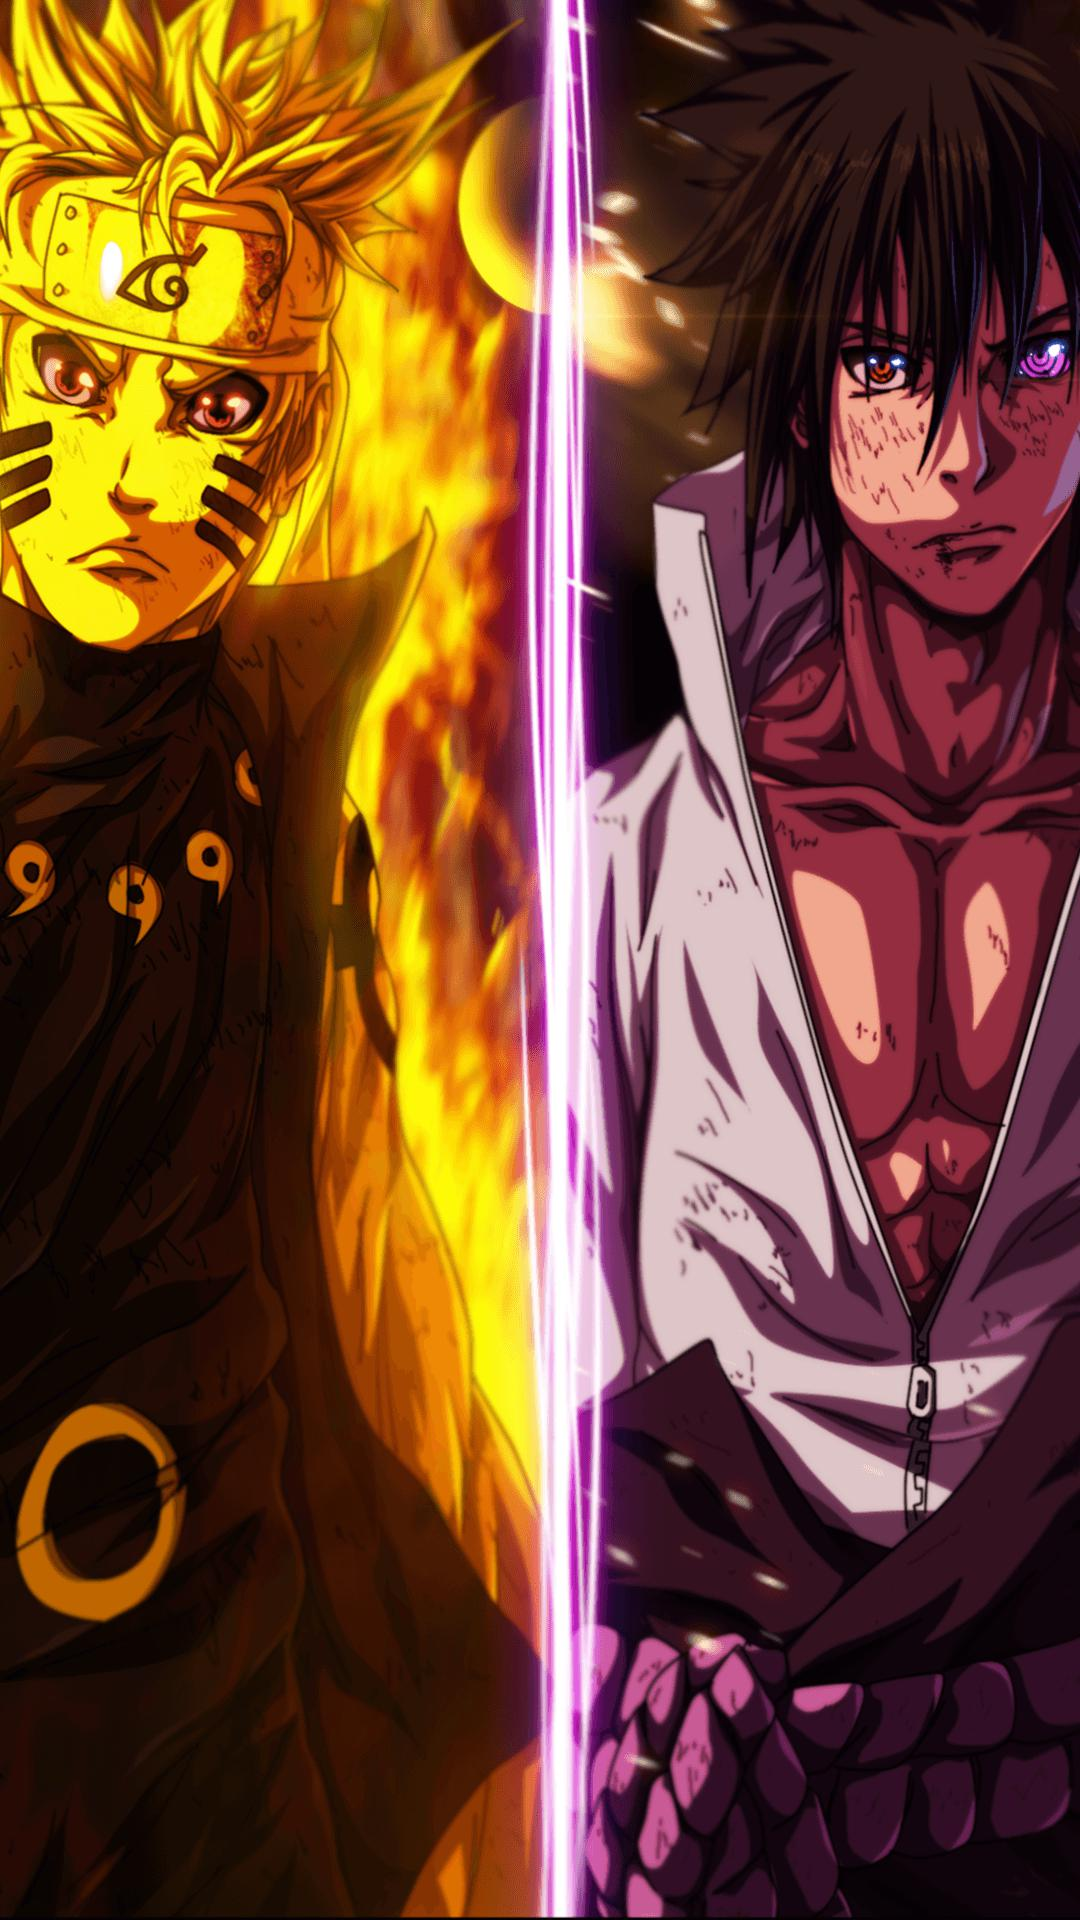 download Naruto And Sasuke Wallpaper Iphone 439224 HD 1080x1920